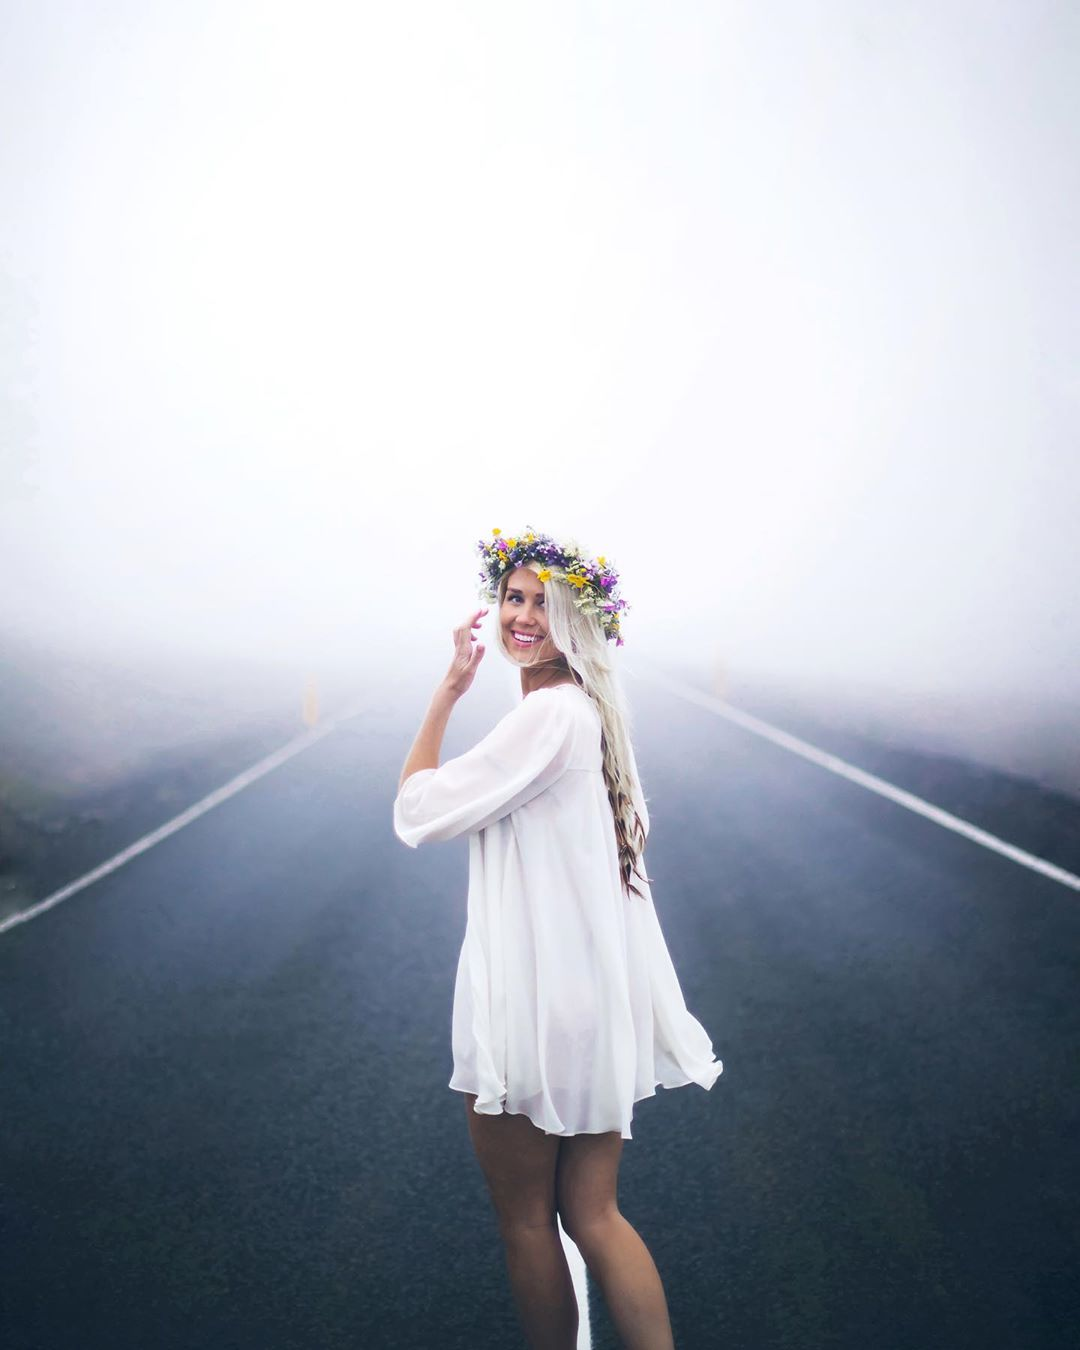 Природа и путешествия на снимках Асы Стейнарс